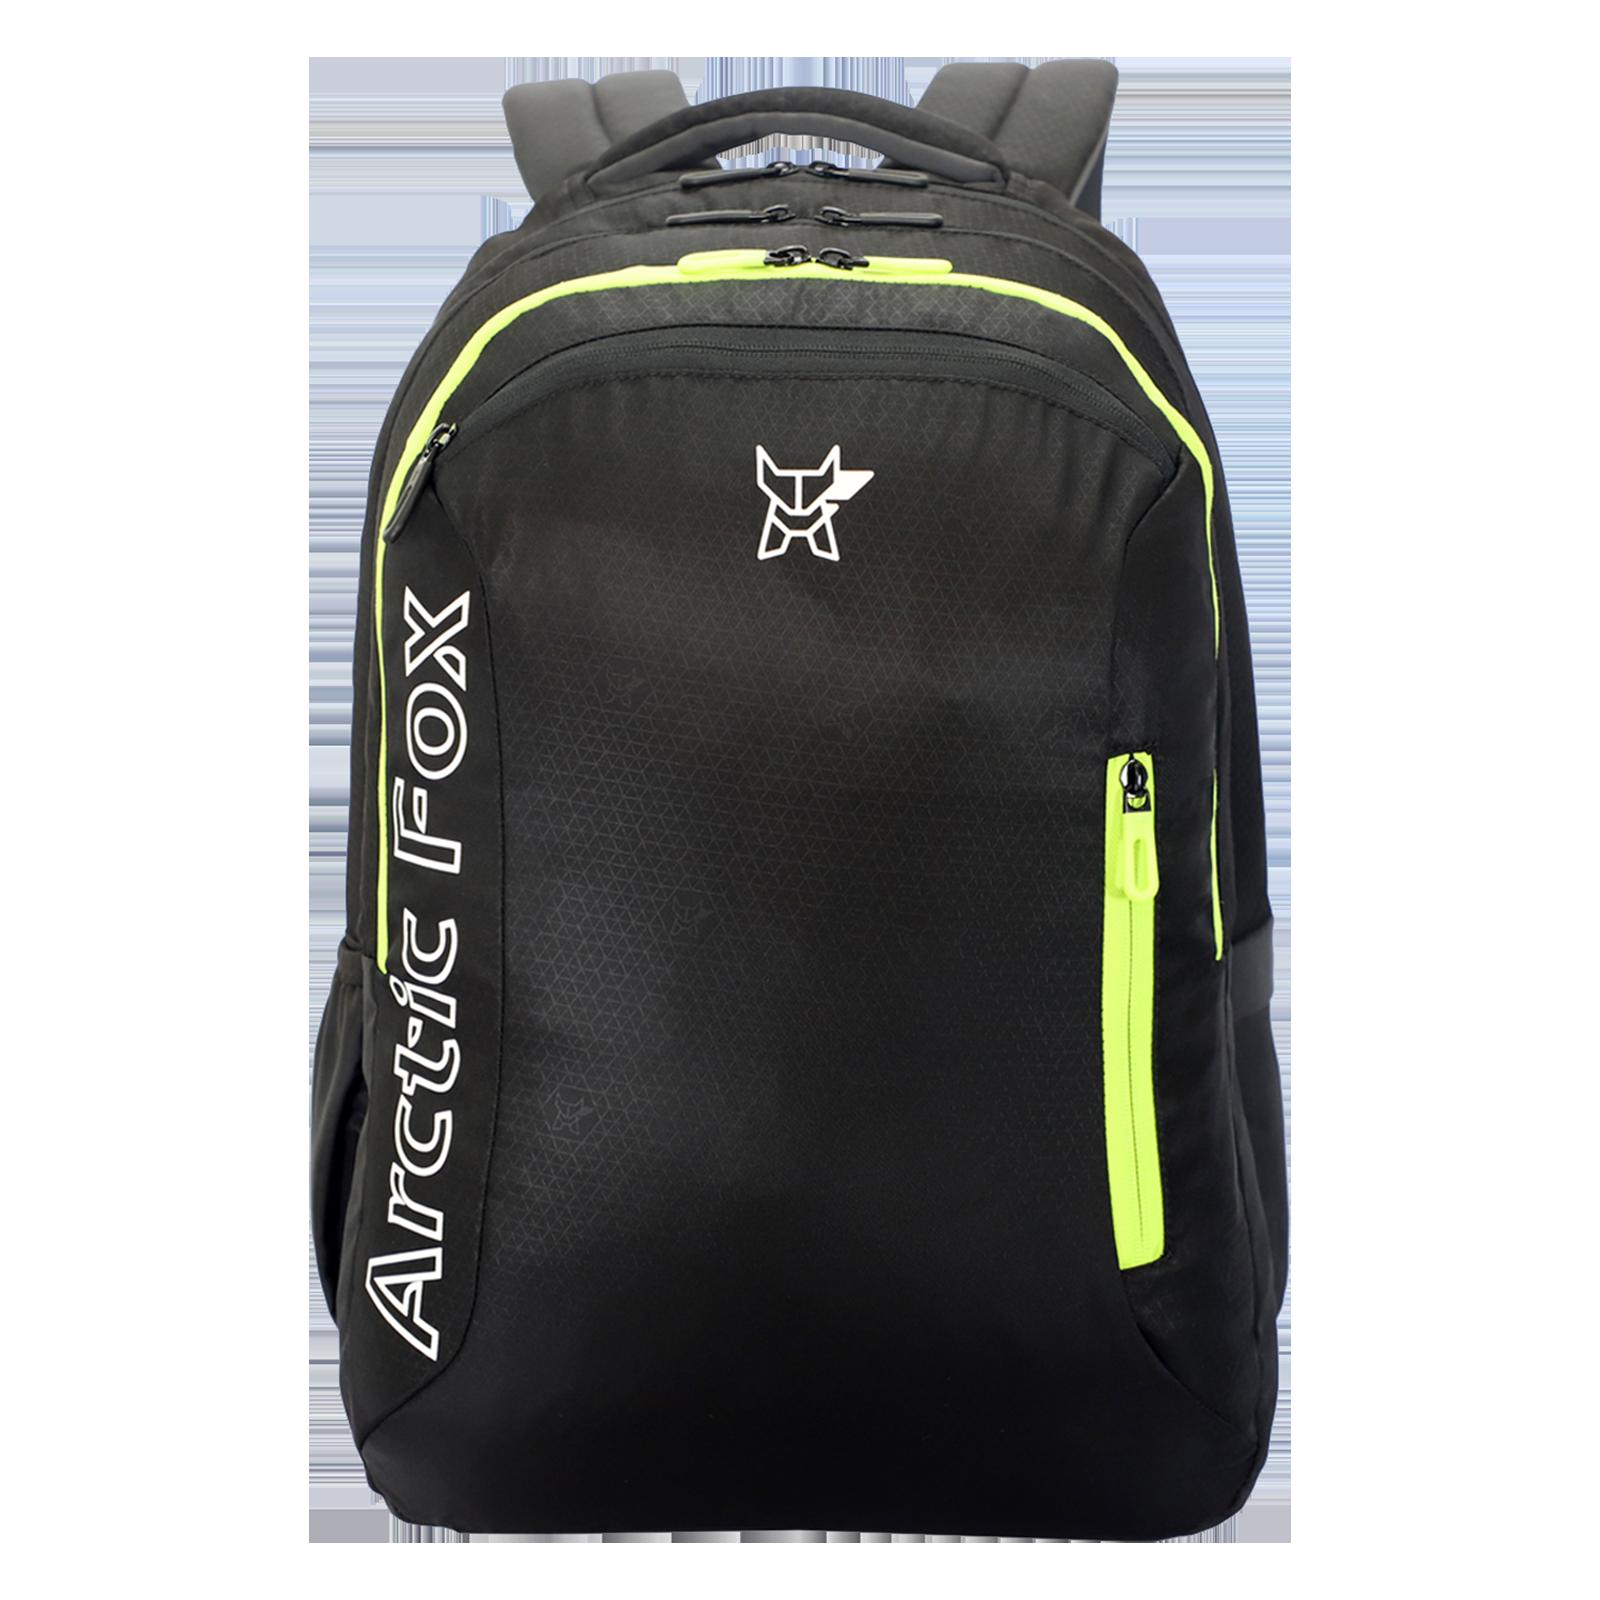 Arctic Fox Arc Jet 40 Litres Twill Polyester Backpack(Drawstring Rain Cover, FJUBPKJTBON030040, Black)_1